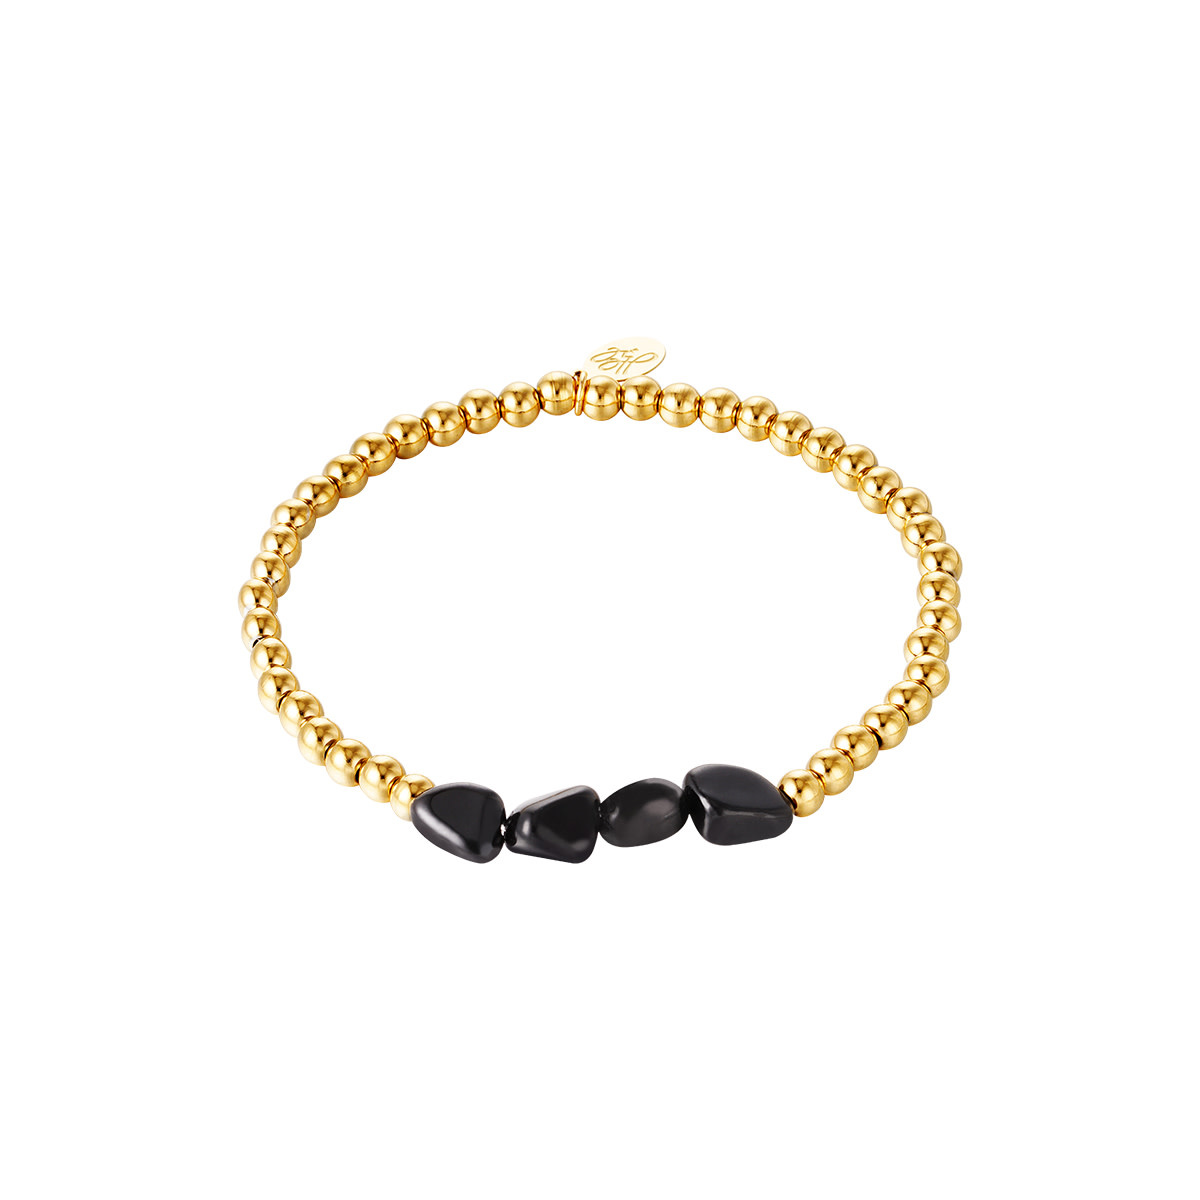 With love Bracelet black rocks